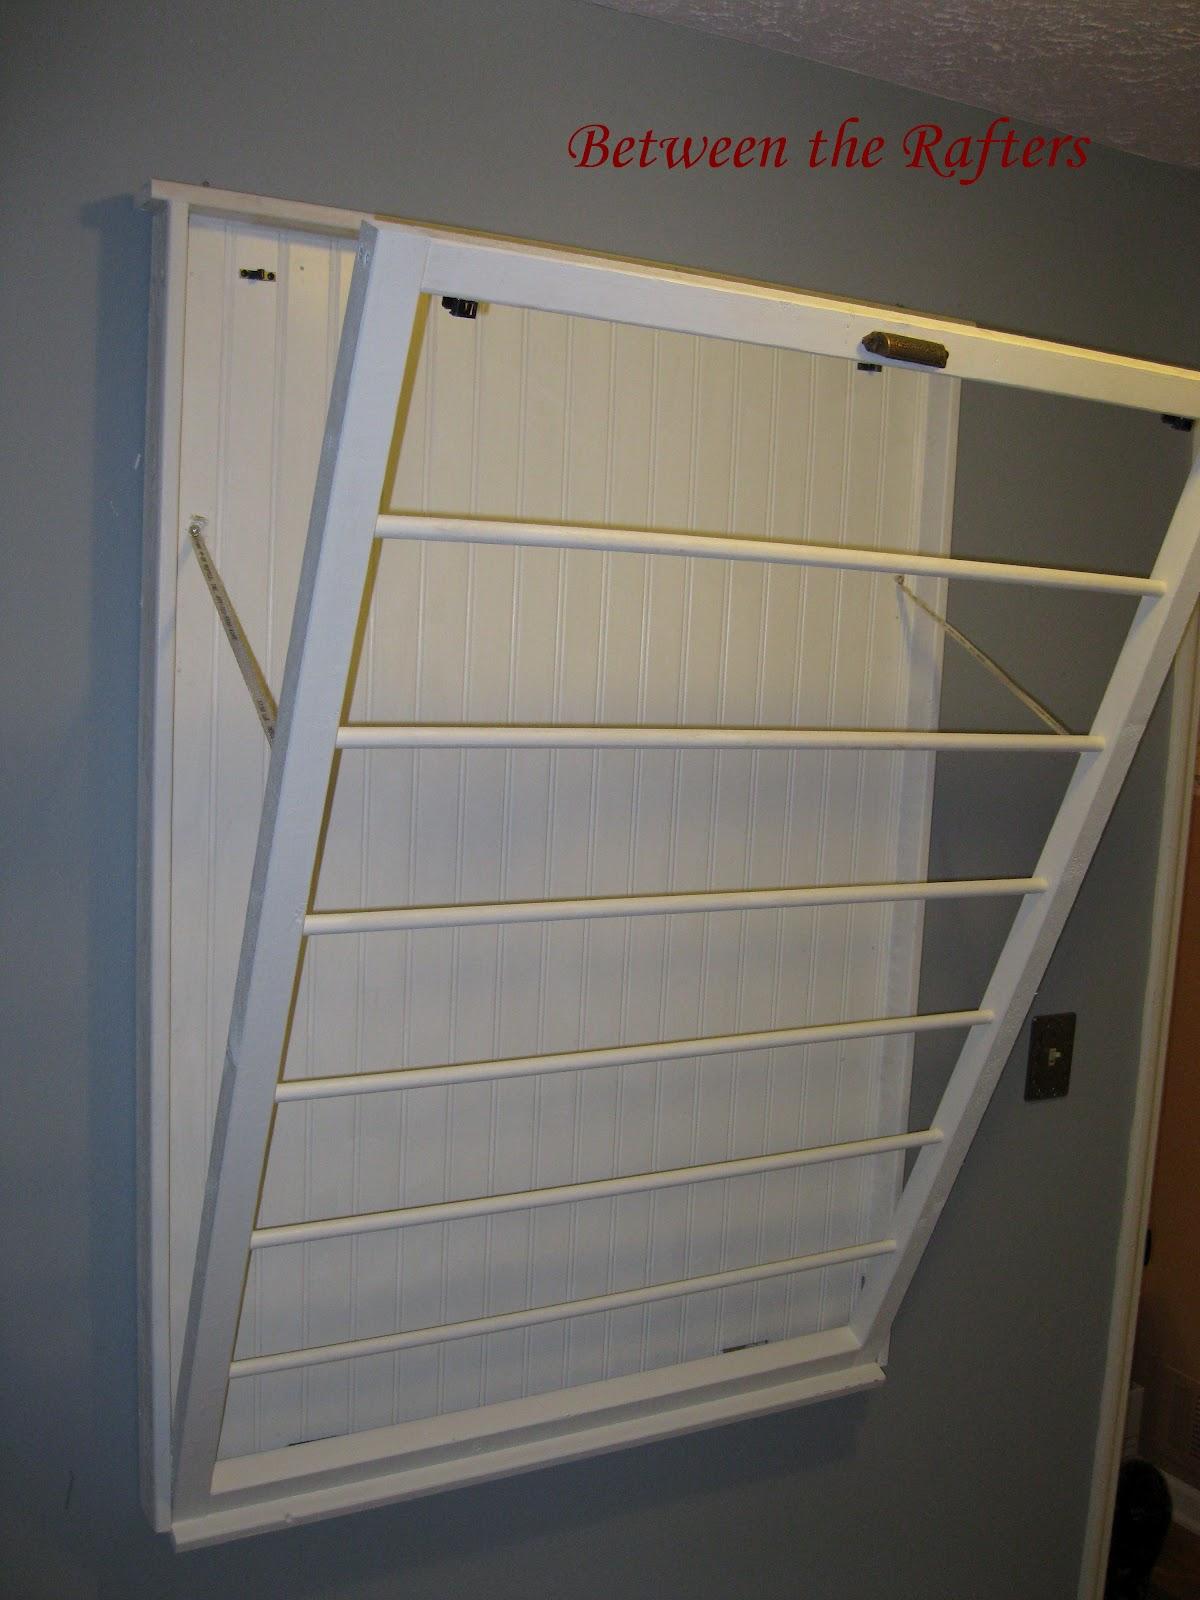 between the rafters ballard designs inspired laundry drying rack from ballard designs laundry room ideas